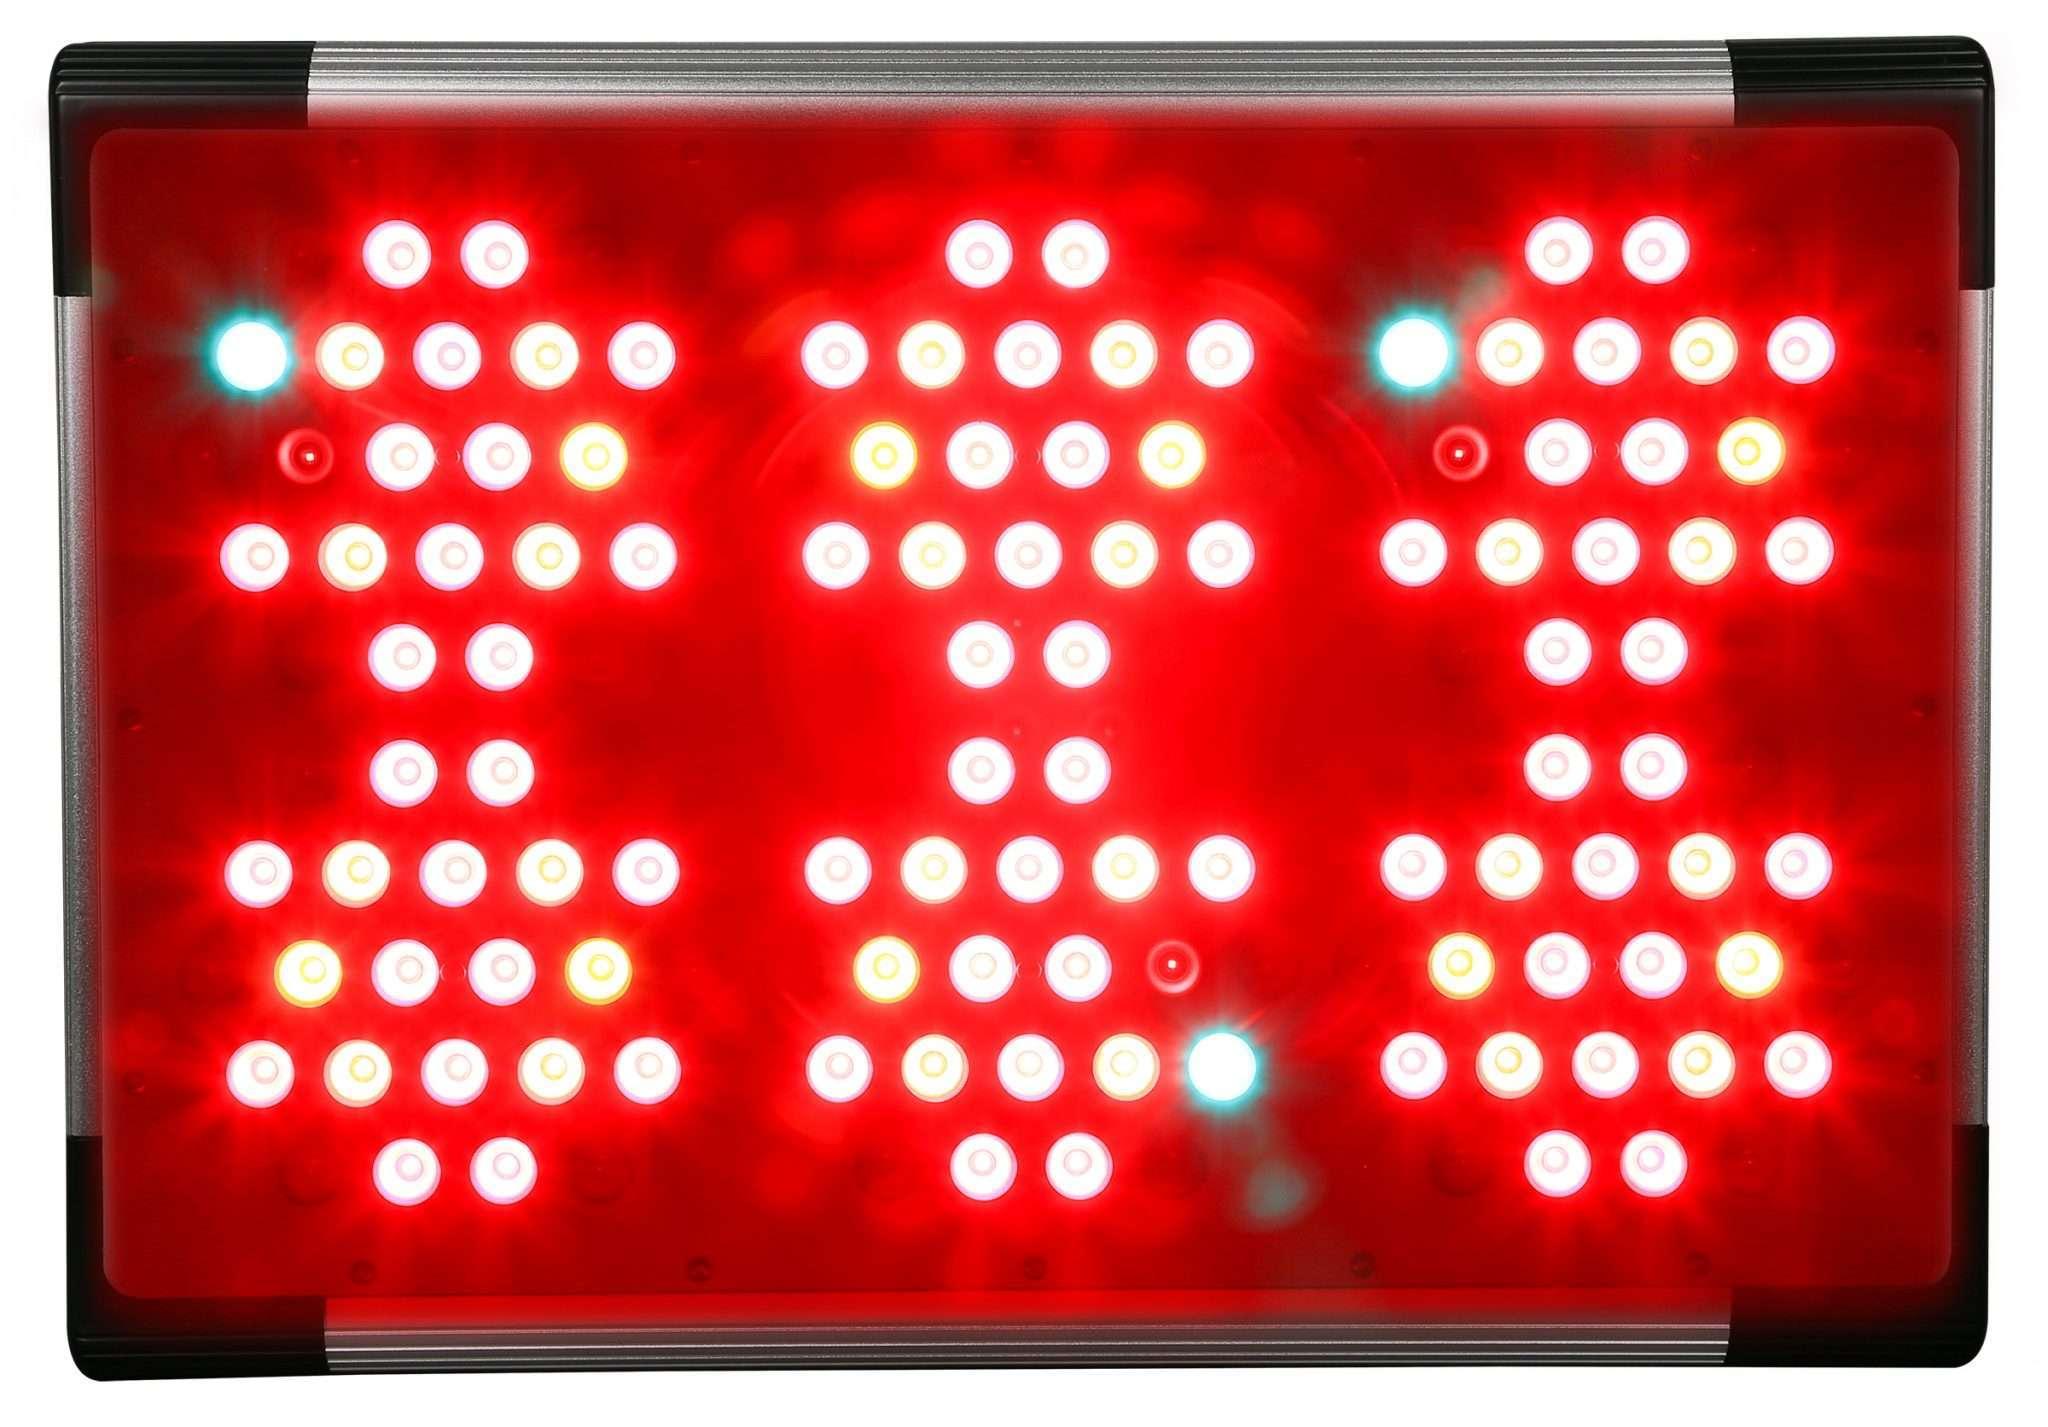 AgroLED Dio-Watt 432, 265W Full Spectrum Low Pro red spectrum